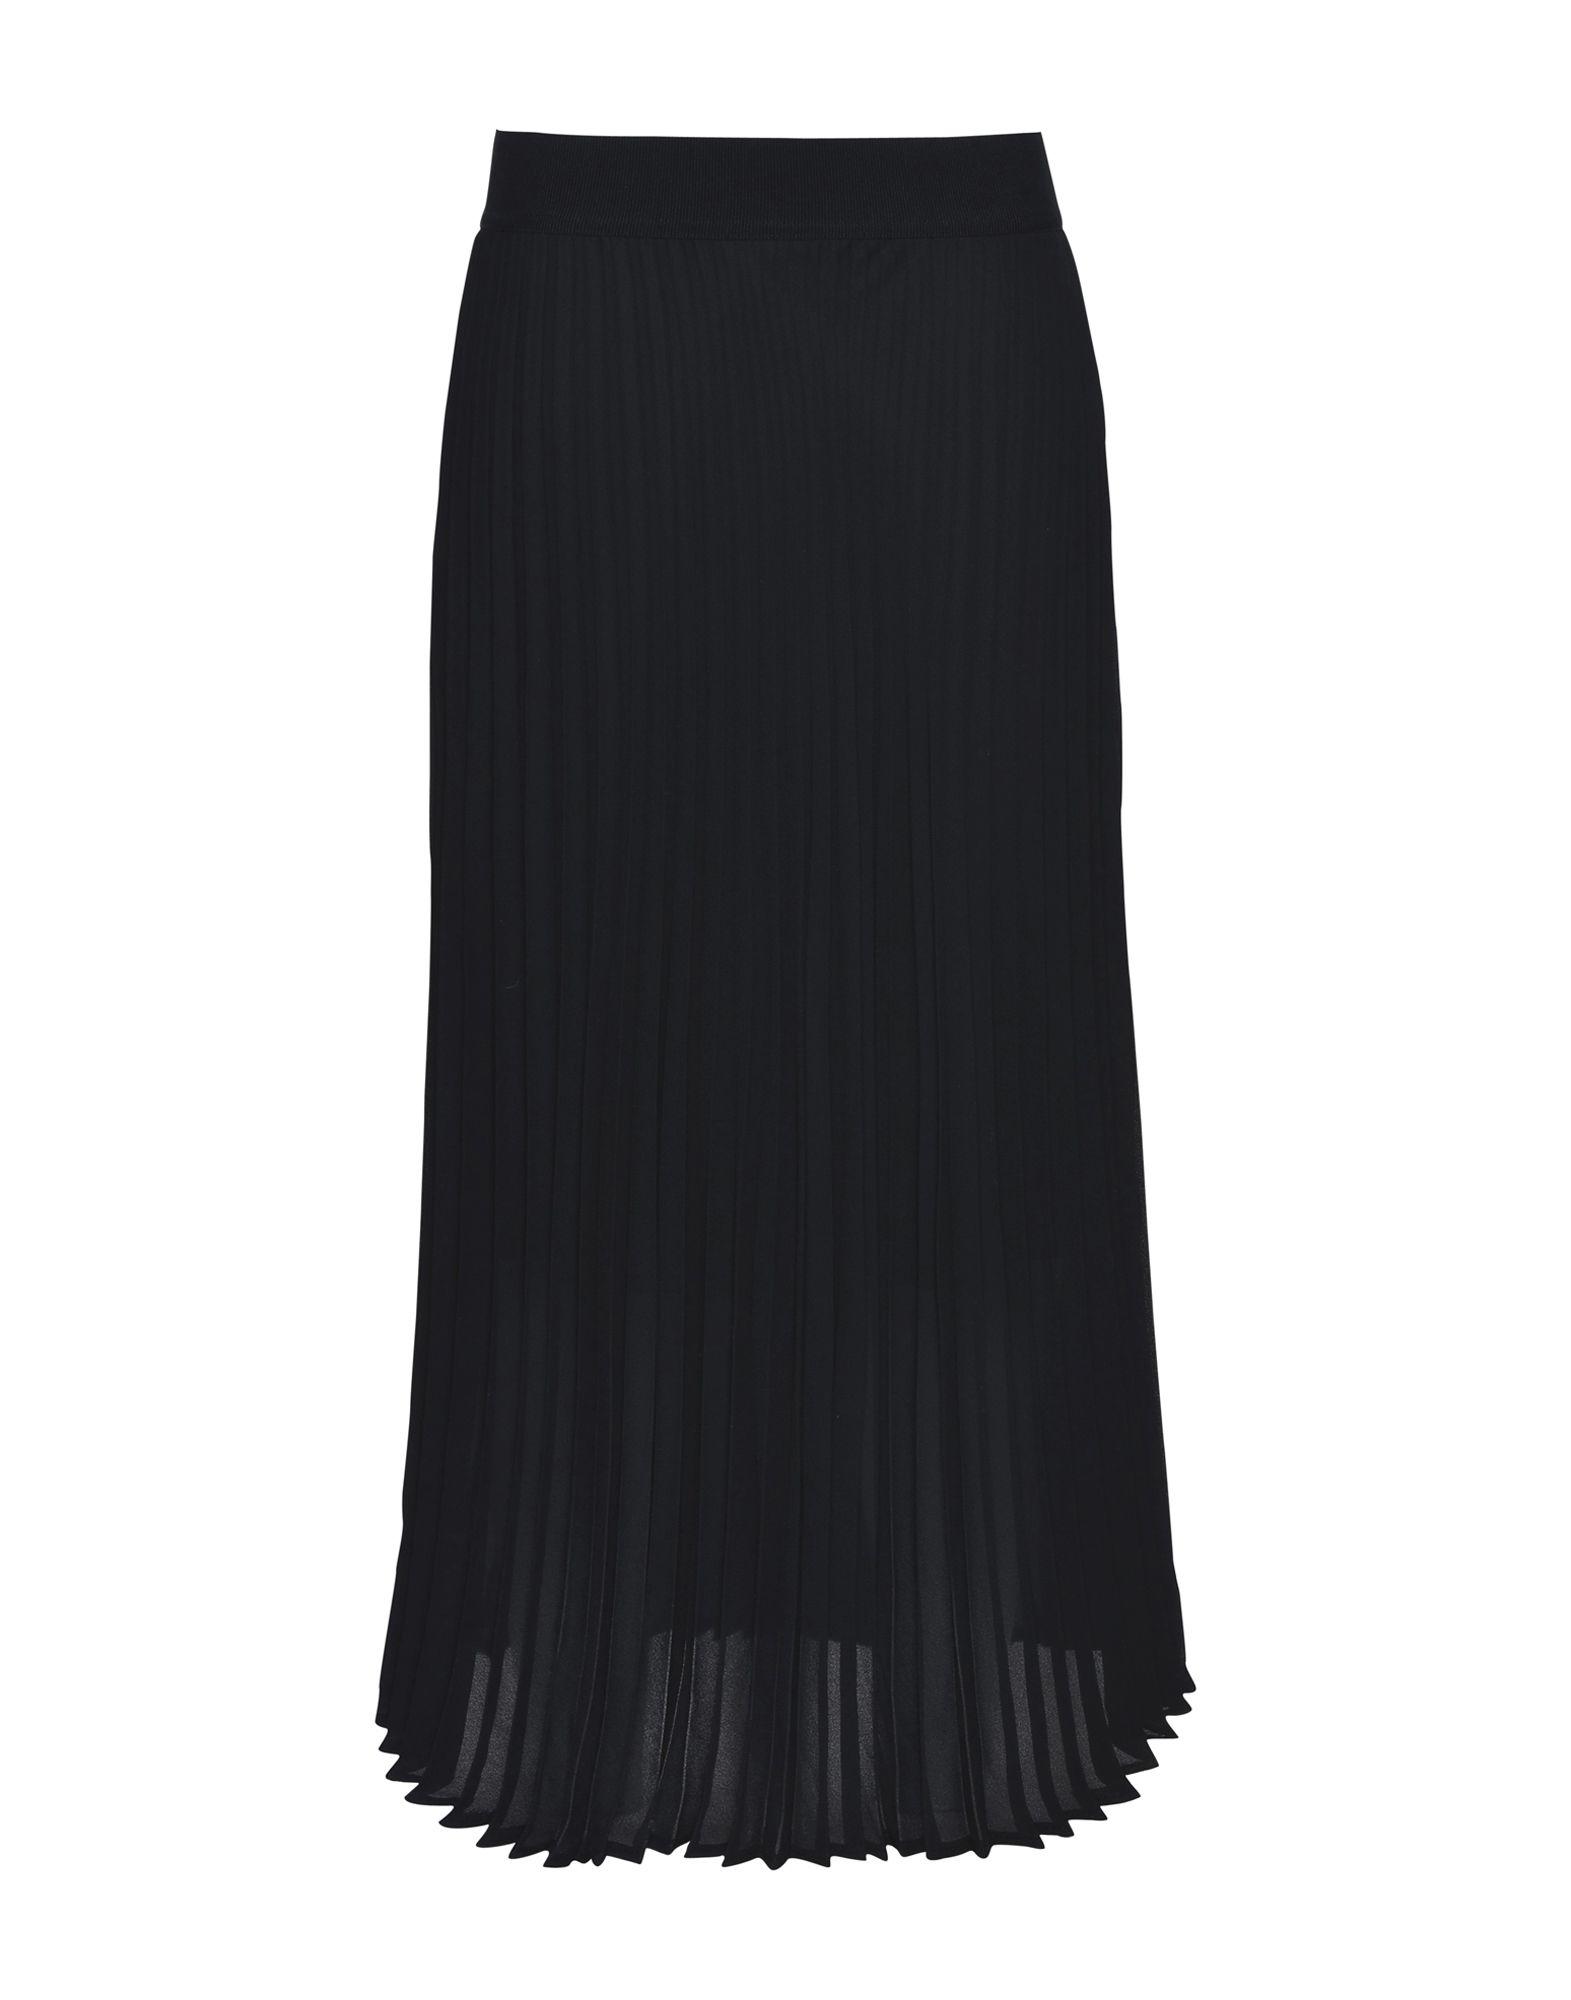 8 Длинная юбка юбка brusnika brusnika br032ewwsq30